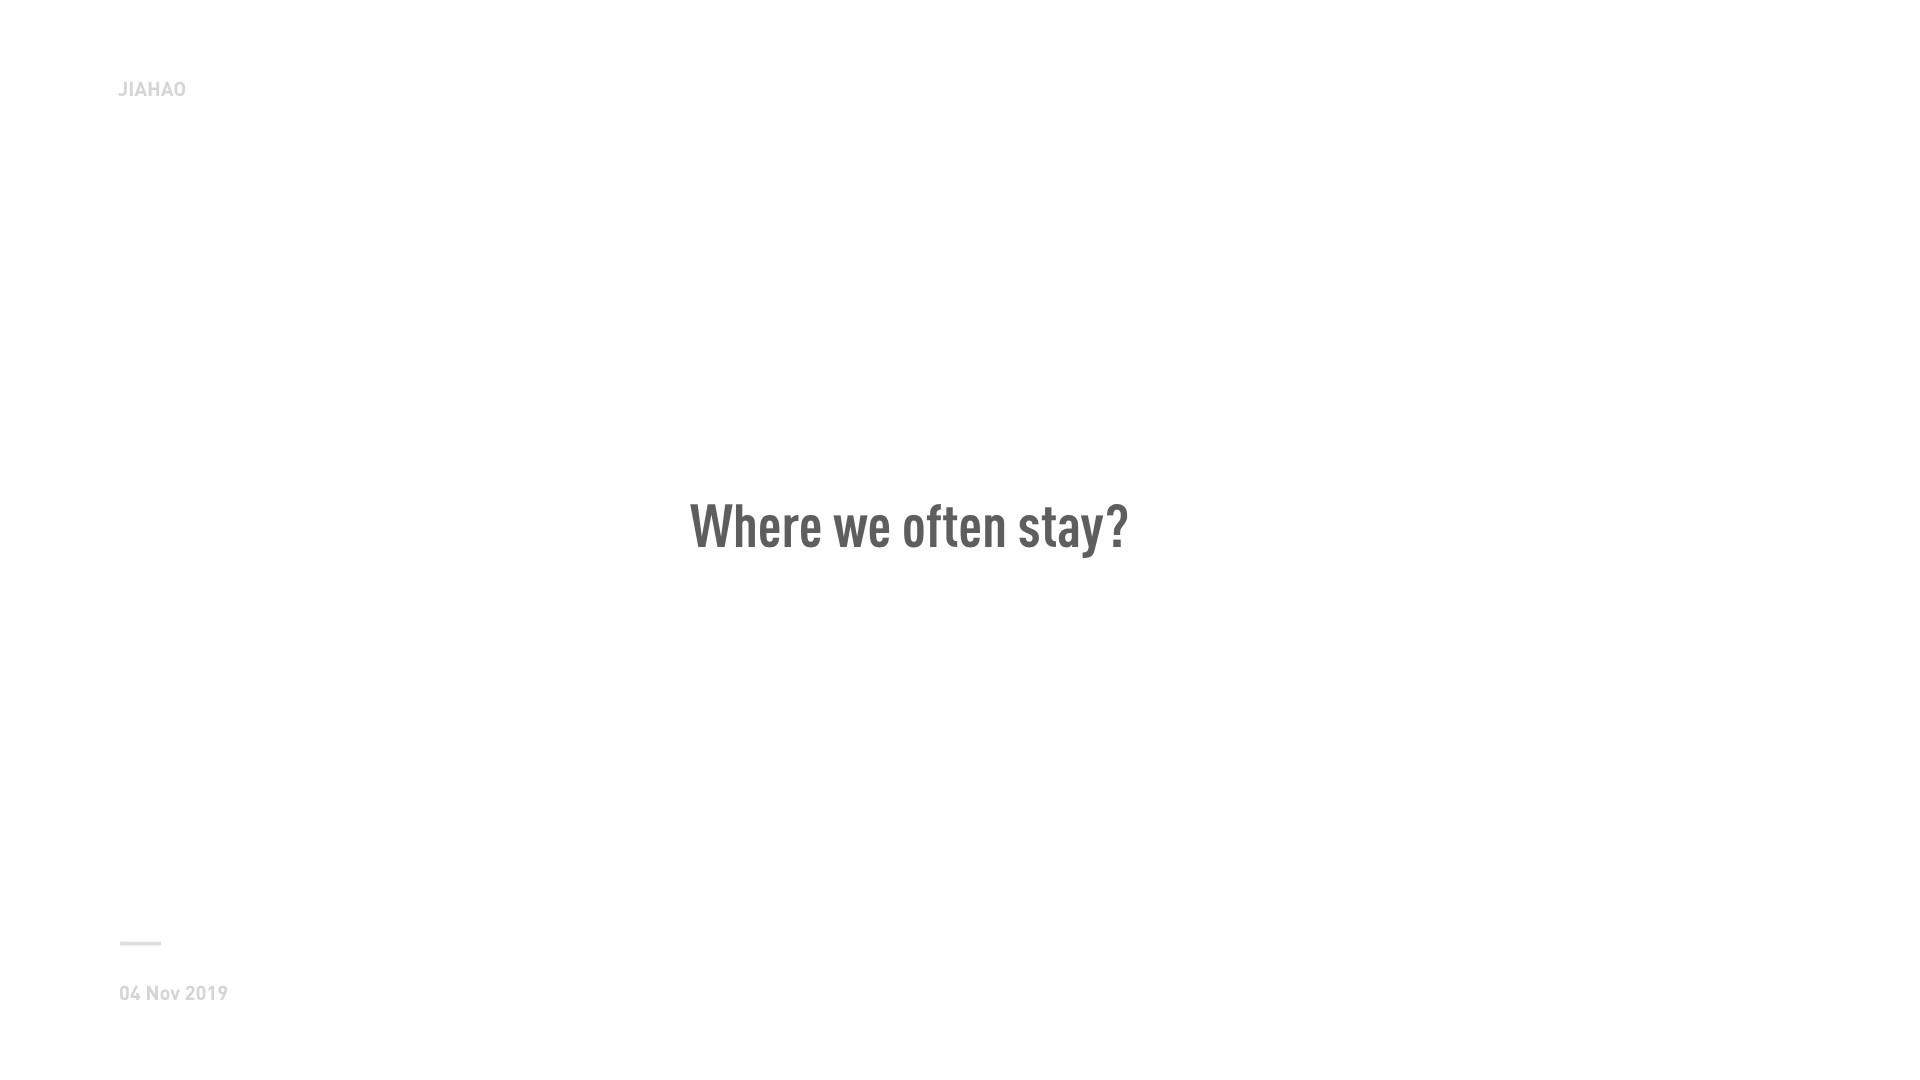 Where we often stay.002.jpeg